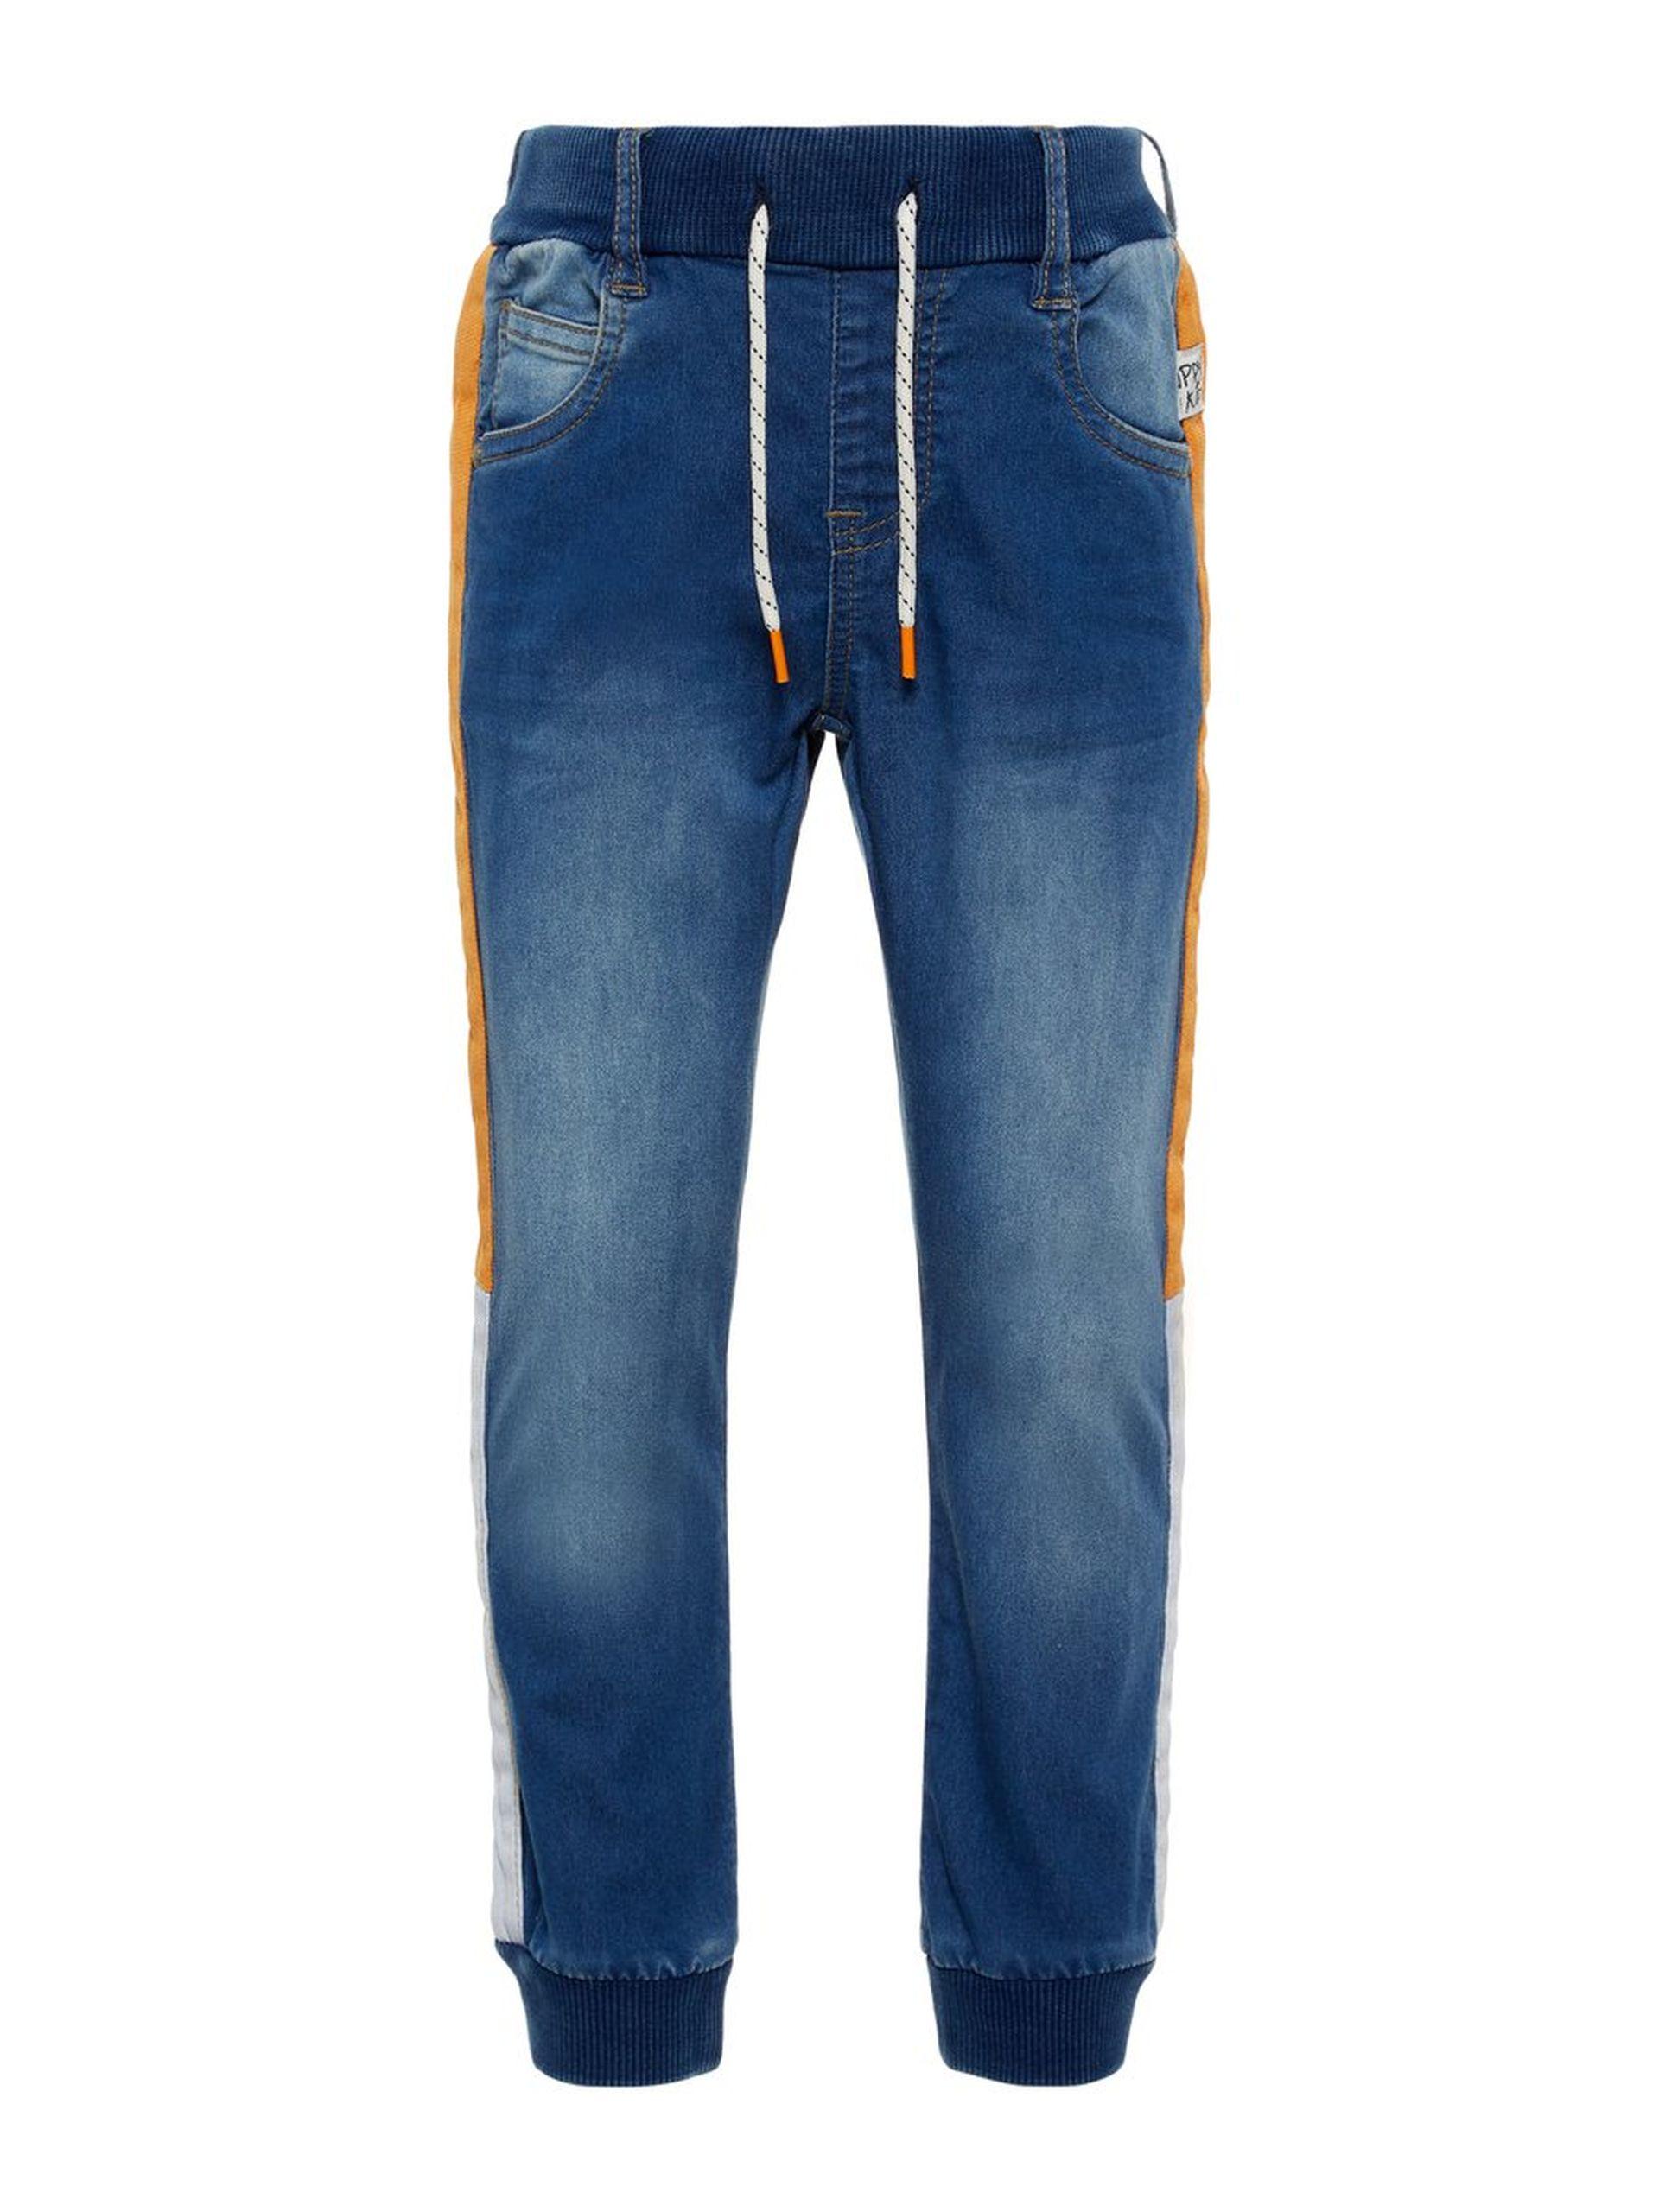 24f3d845 Name It bukse gutt – Name It denimbukse med oransje striper – Mio Trend